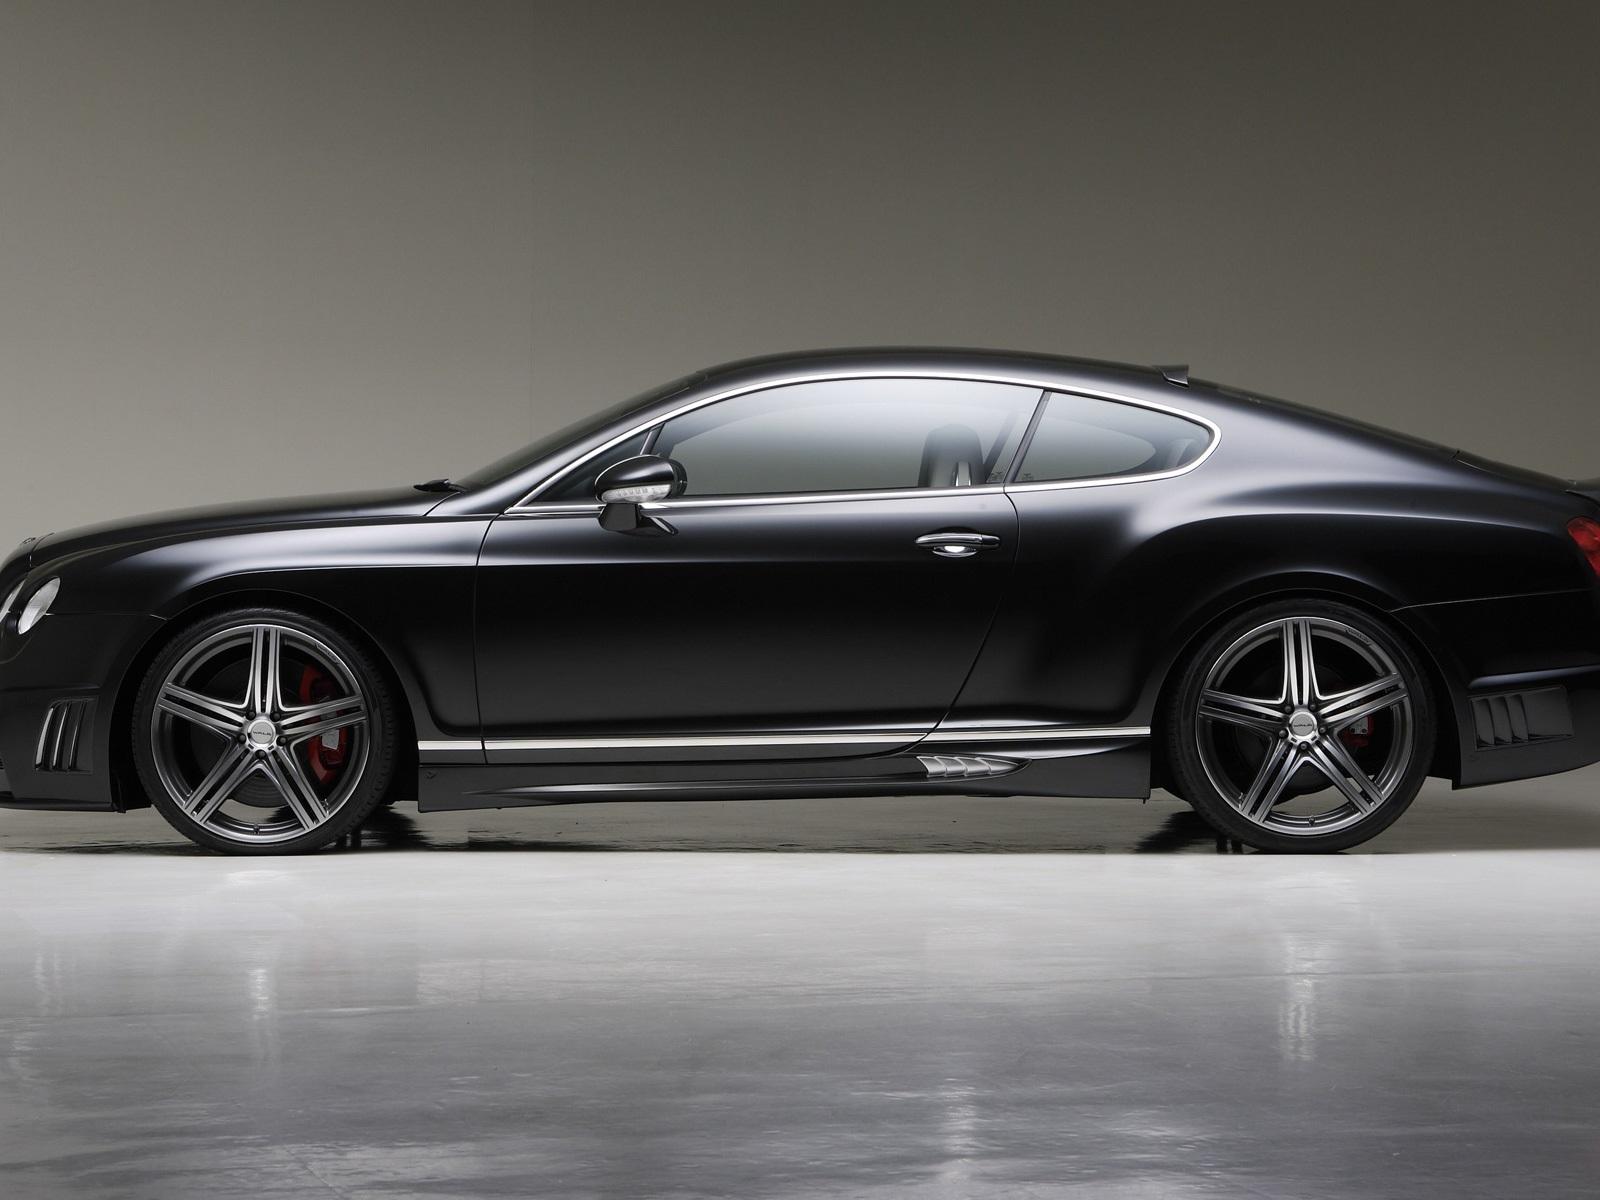 Fondos De Pantalla Vista Lateral Del Bentley Continental Gt Negro Para Autos 1920x1200 Hd Imagen